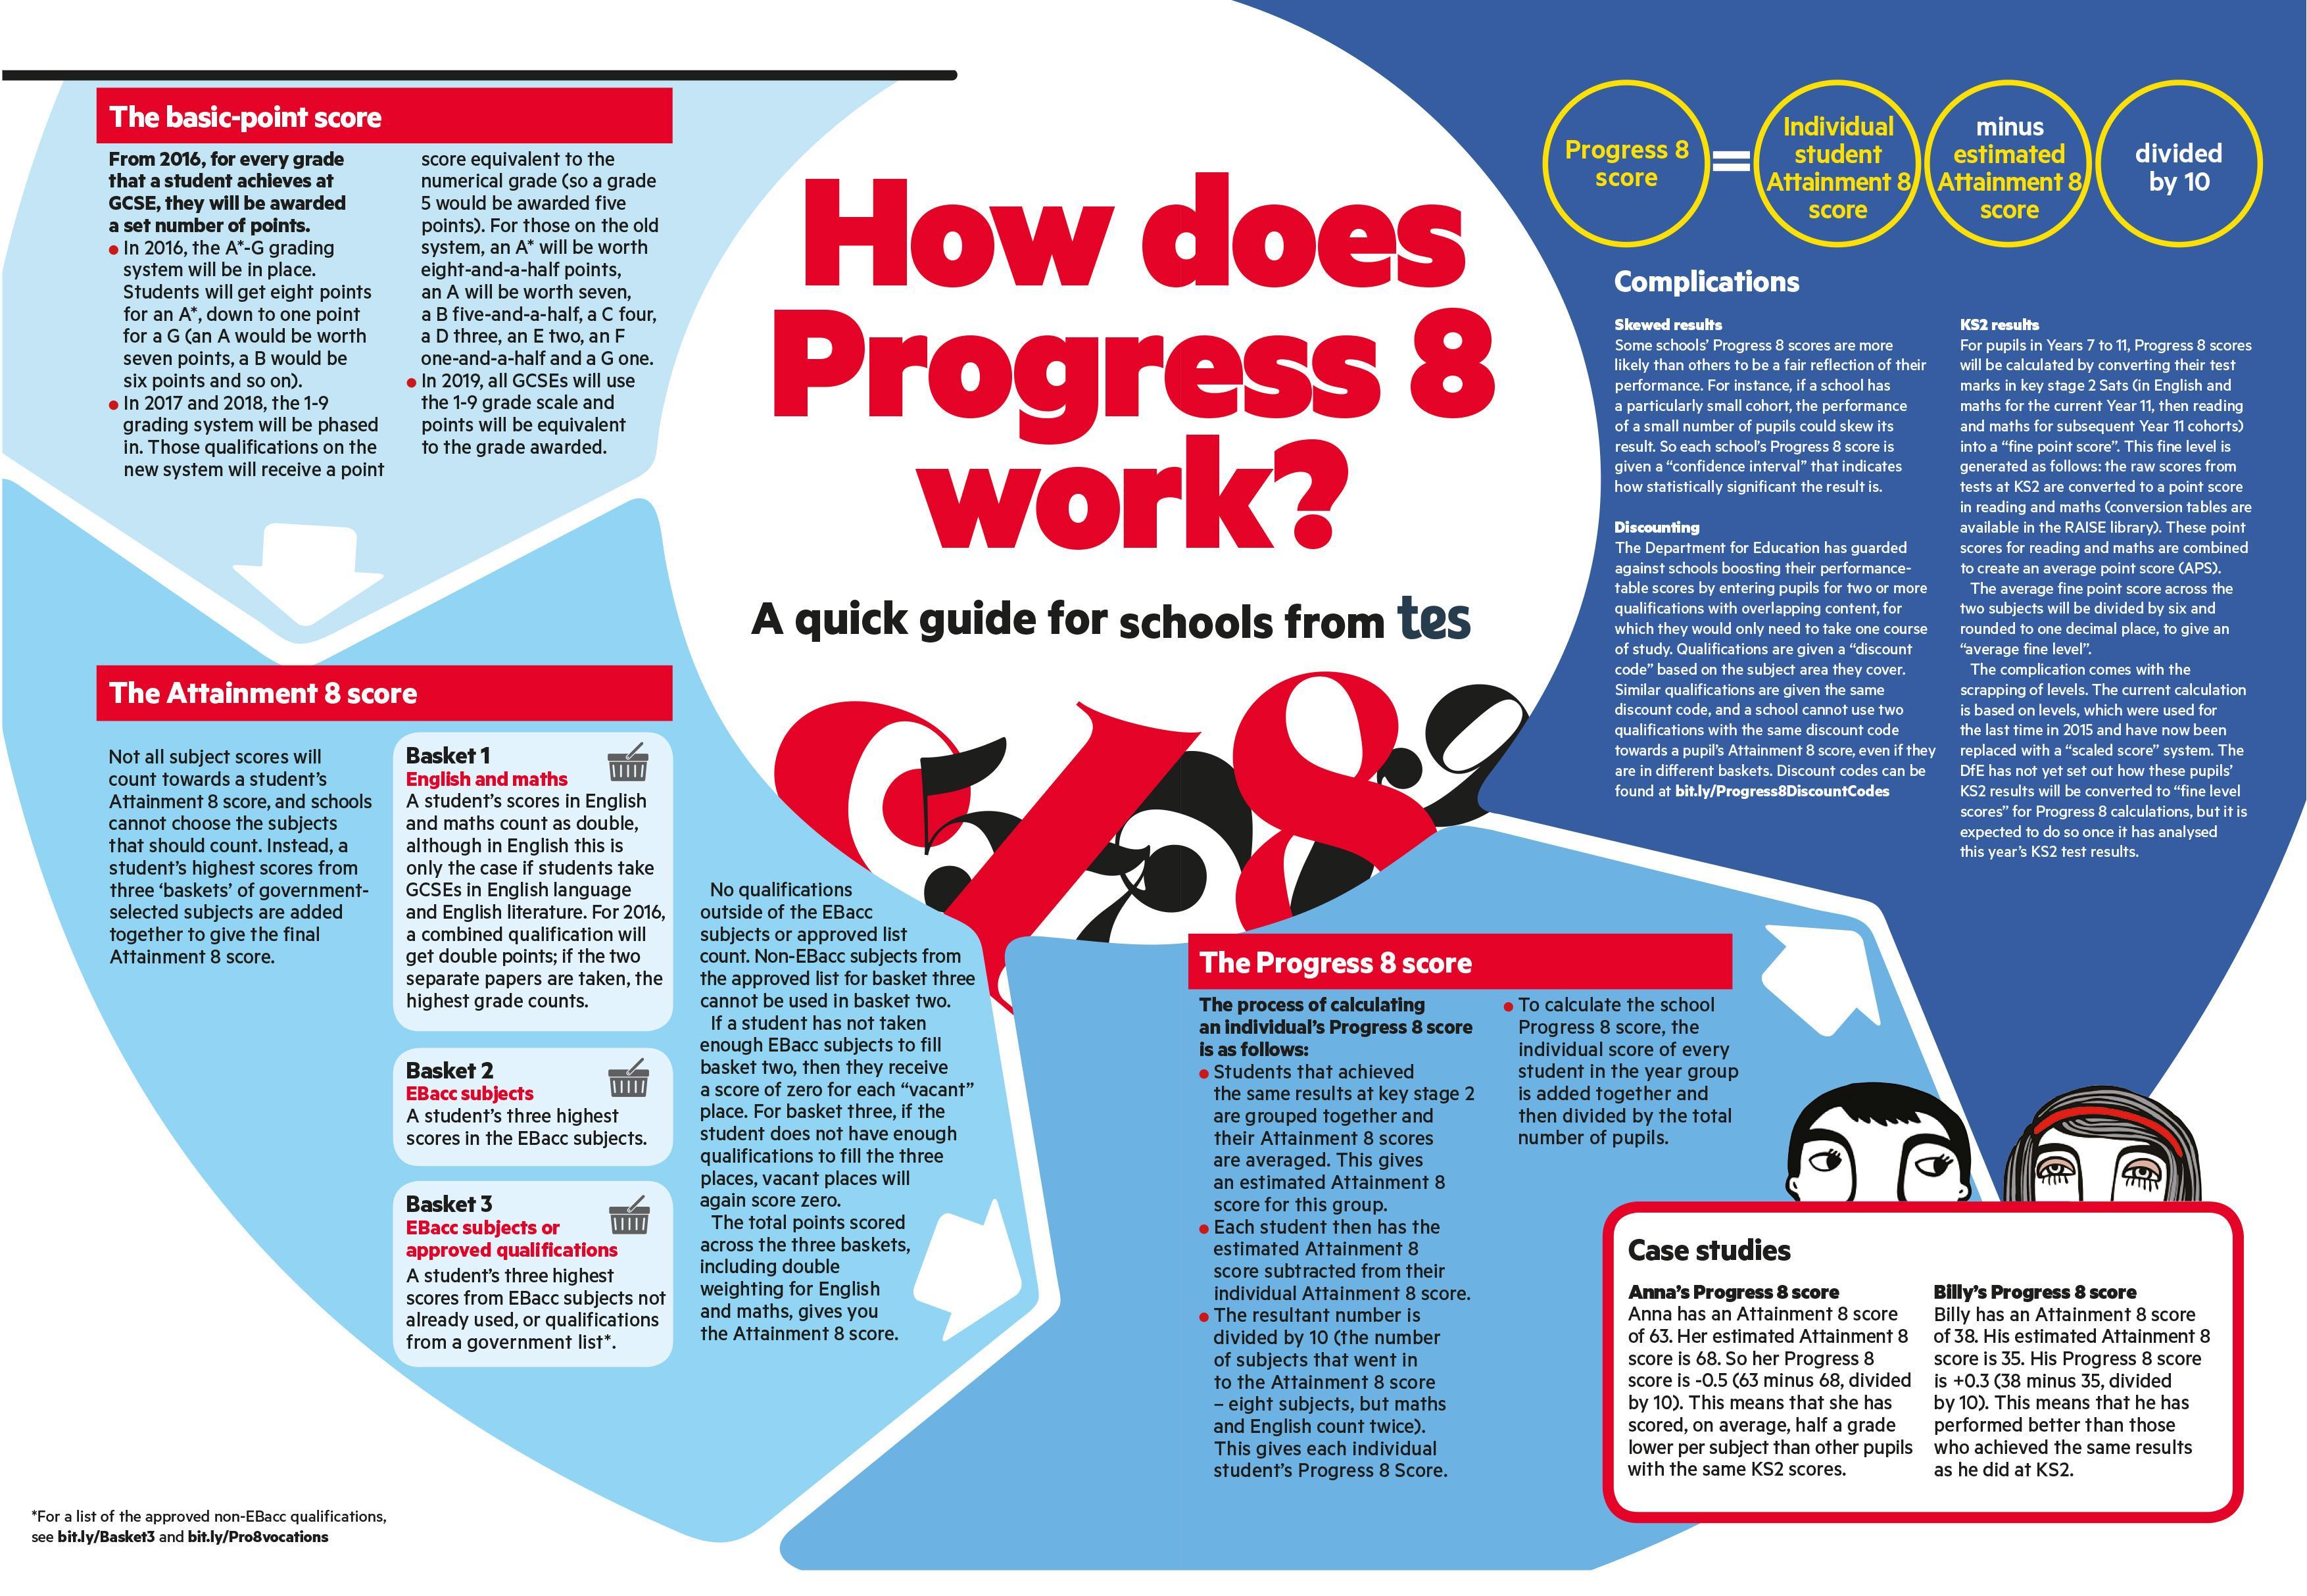 Progress 8 explained, Progress 8, GCSE results day